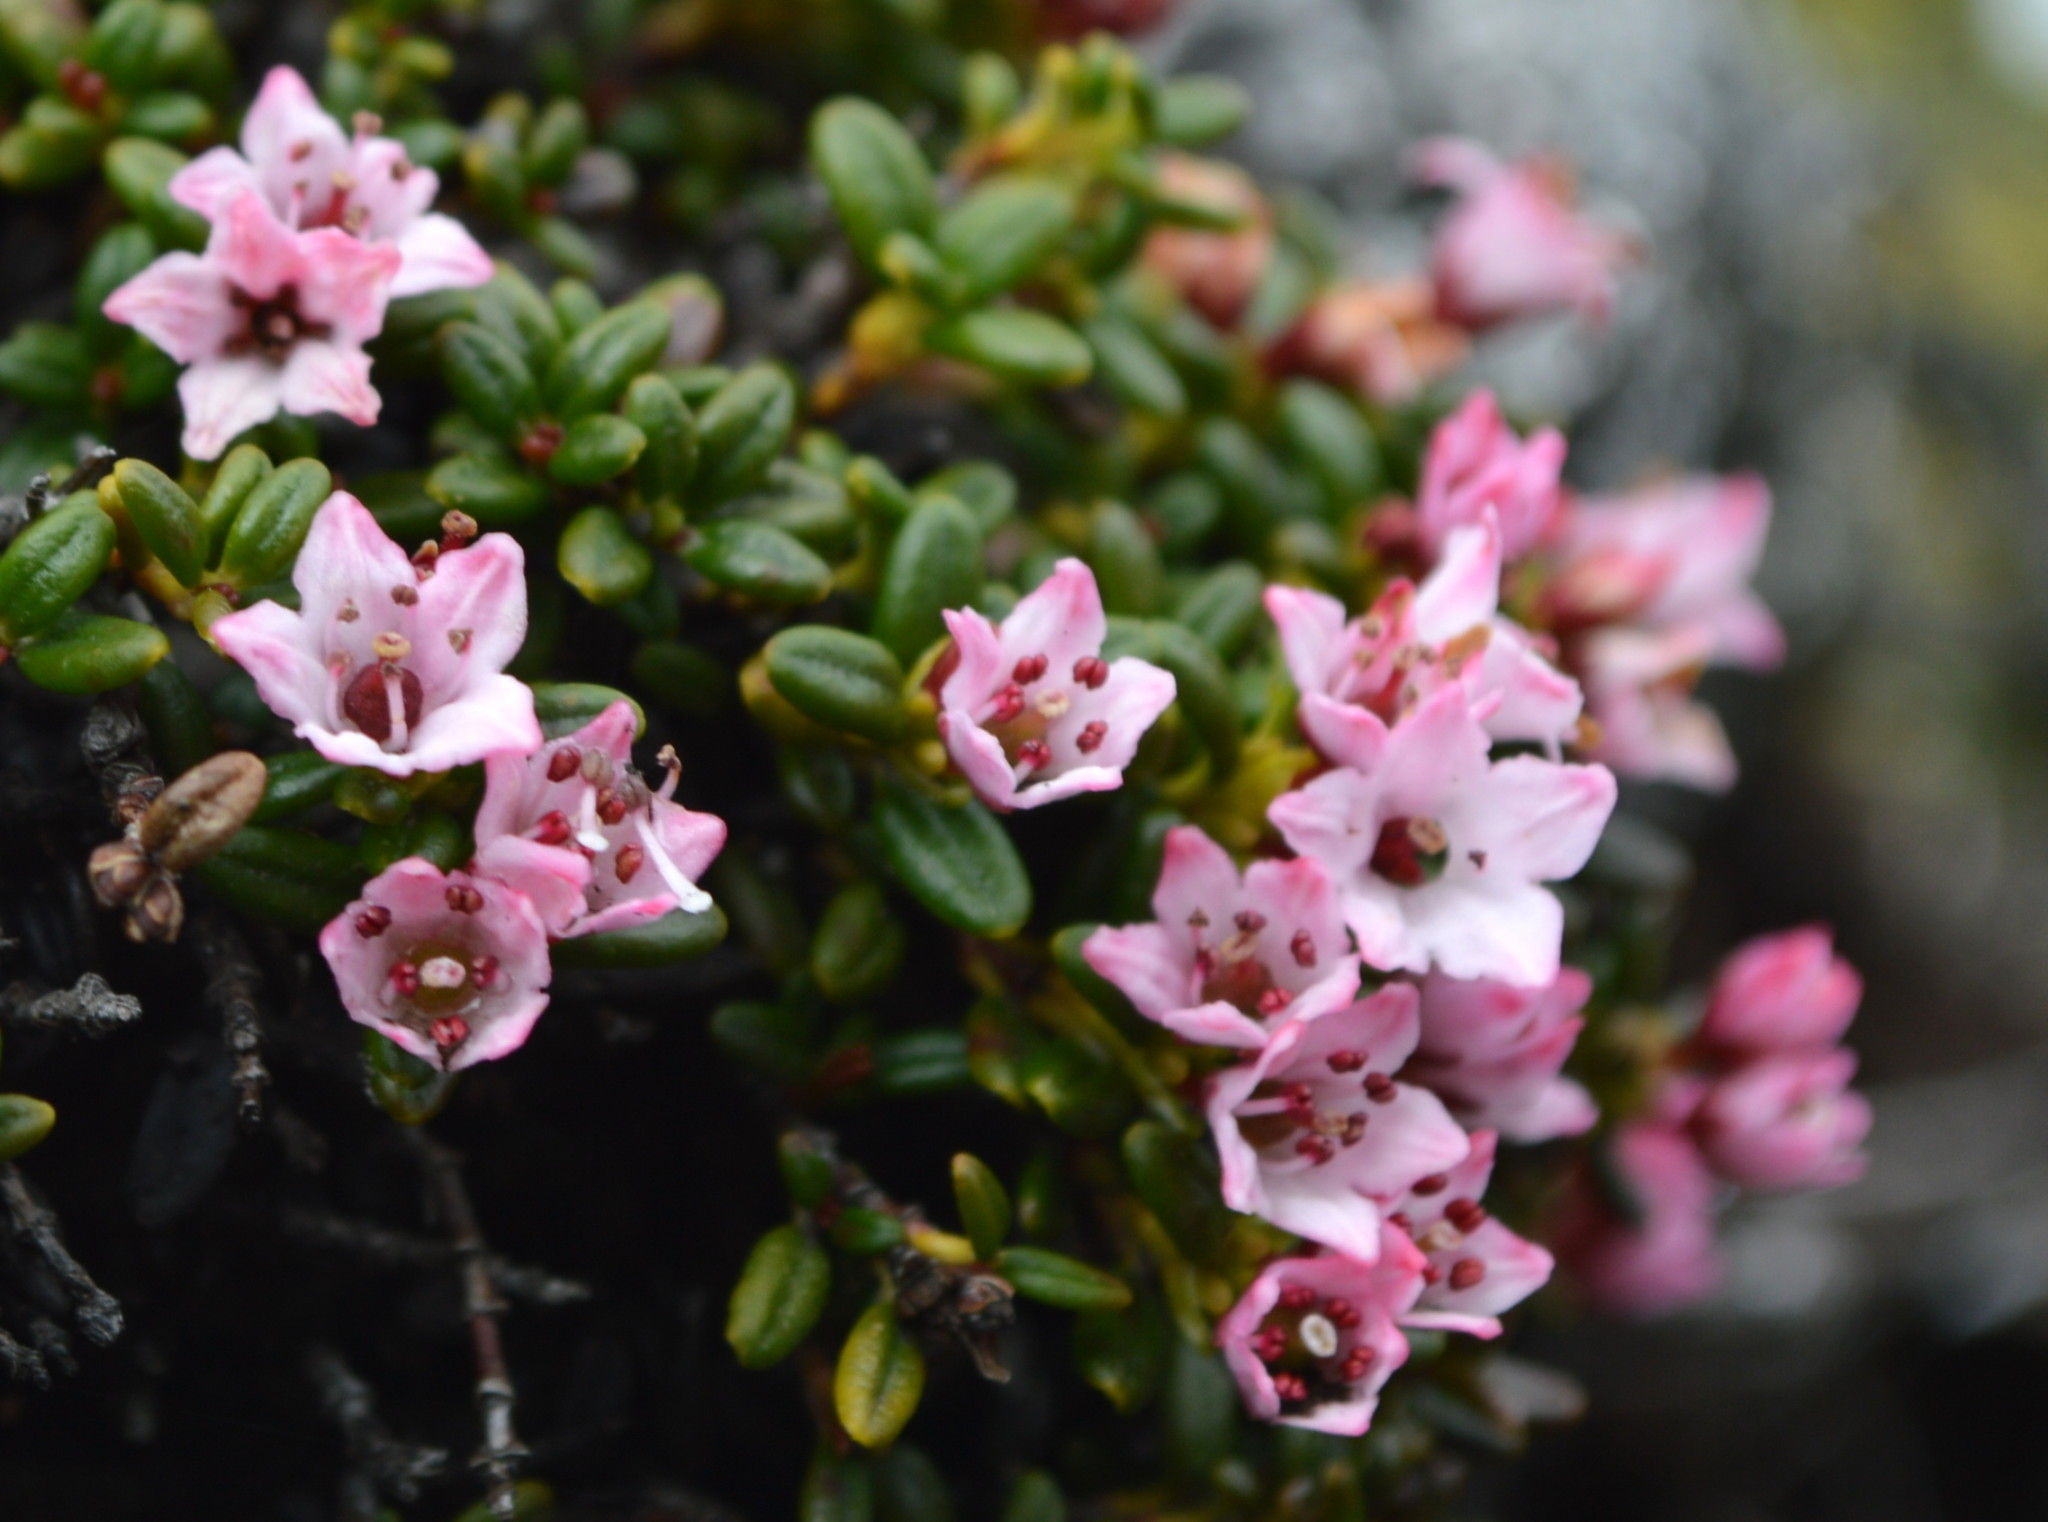 Alpine azalea in bloom